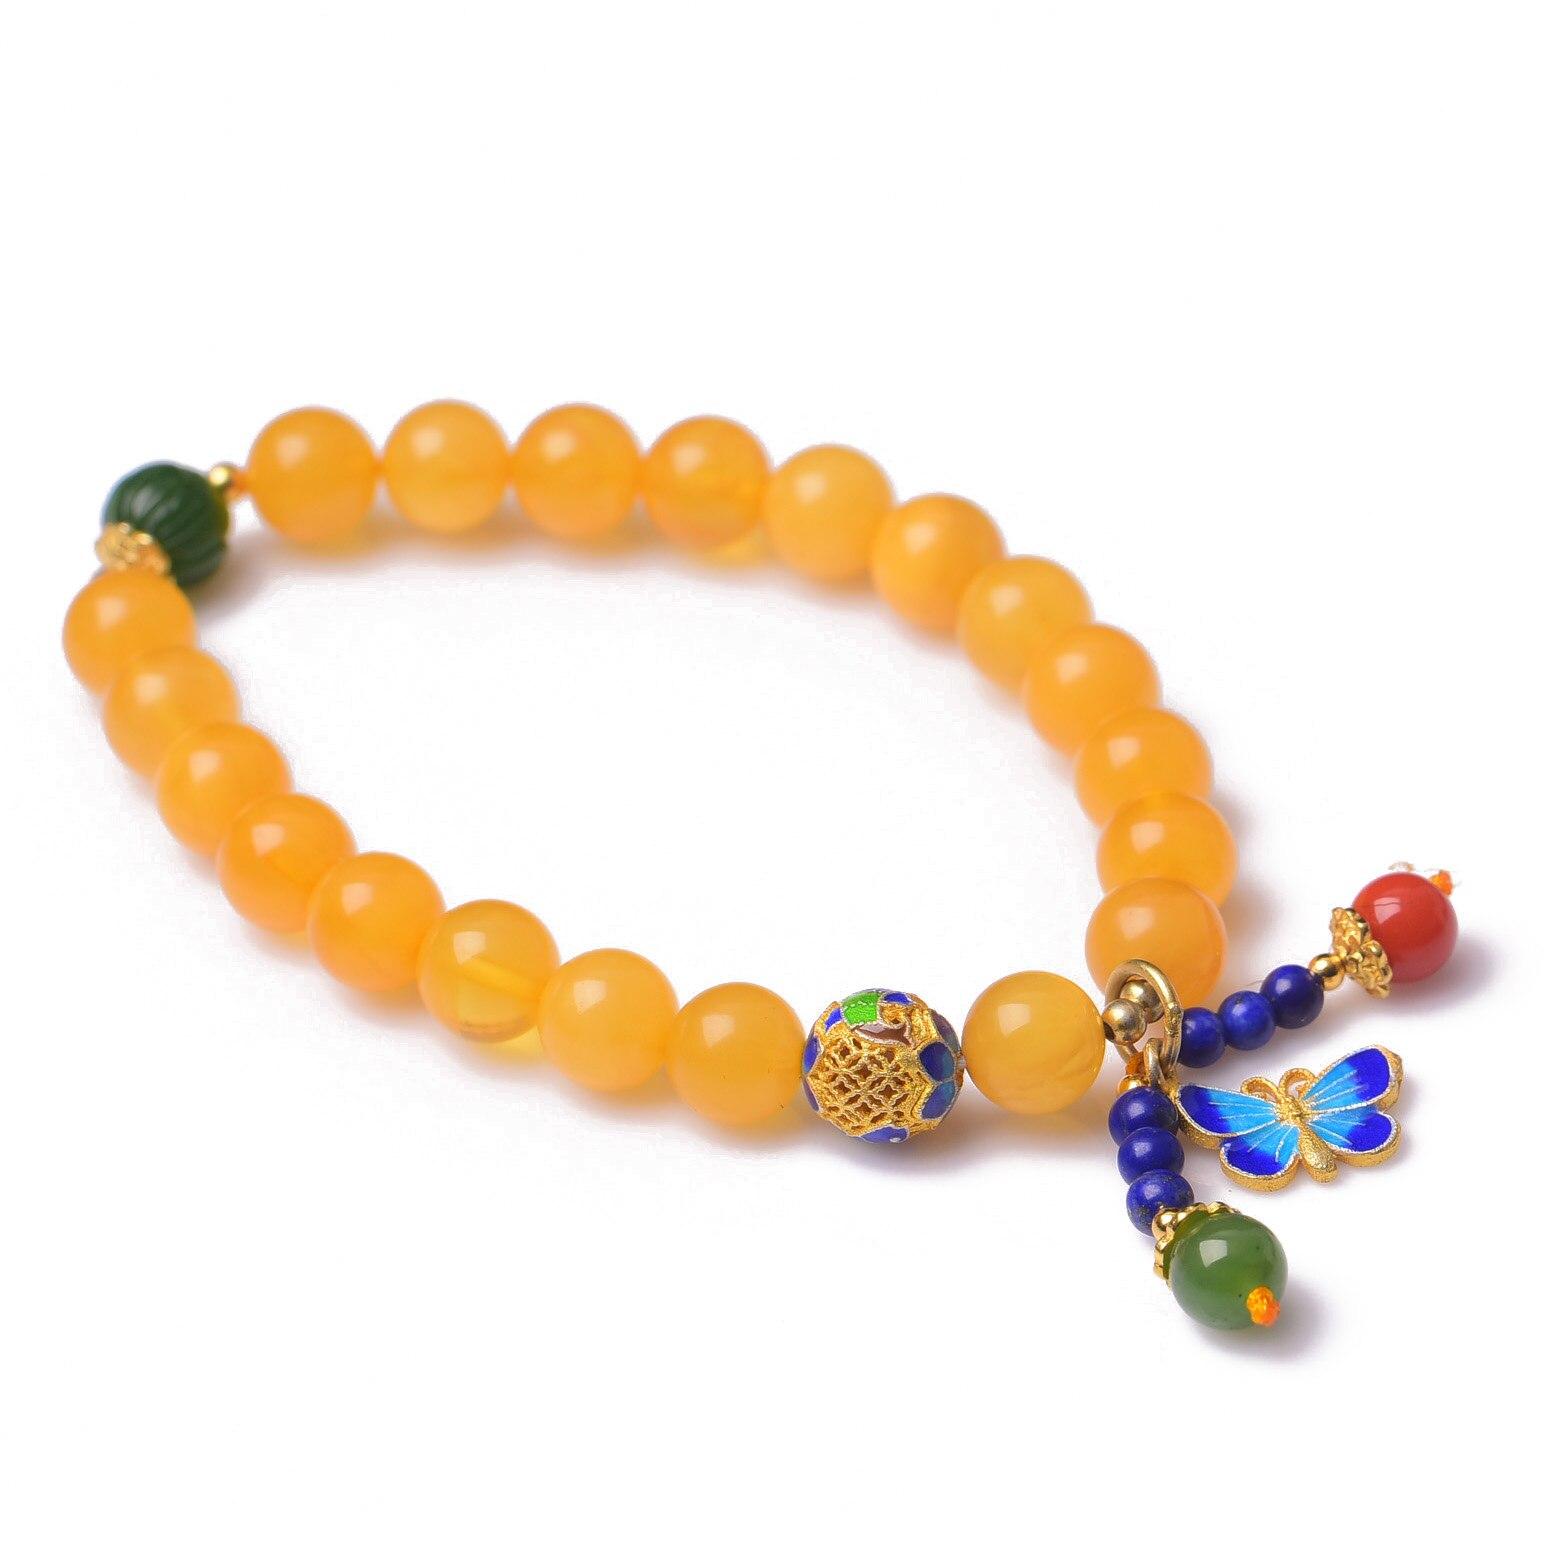 Handmade Authentic Wax Crystal Beads Bracelets 7mm handmade authentic wax crystal bracelets